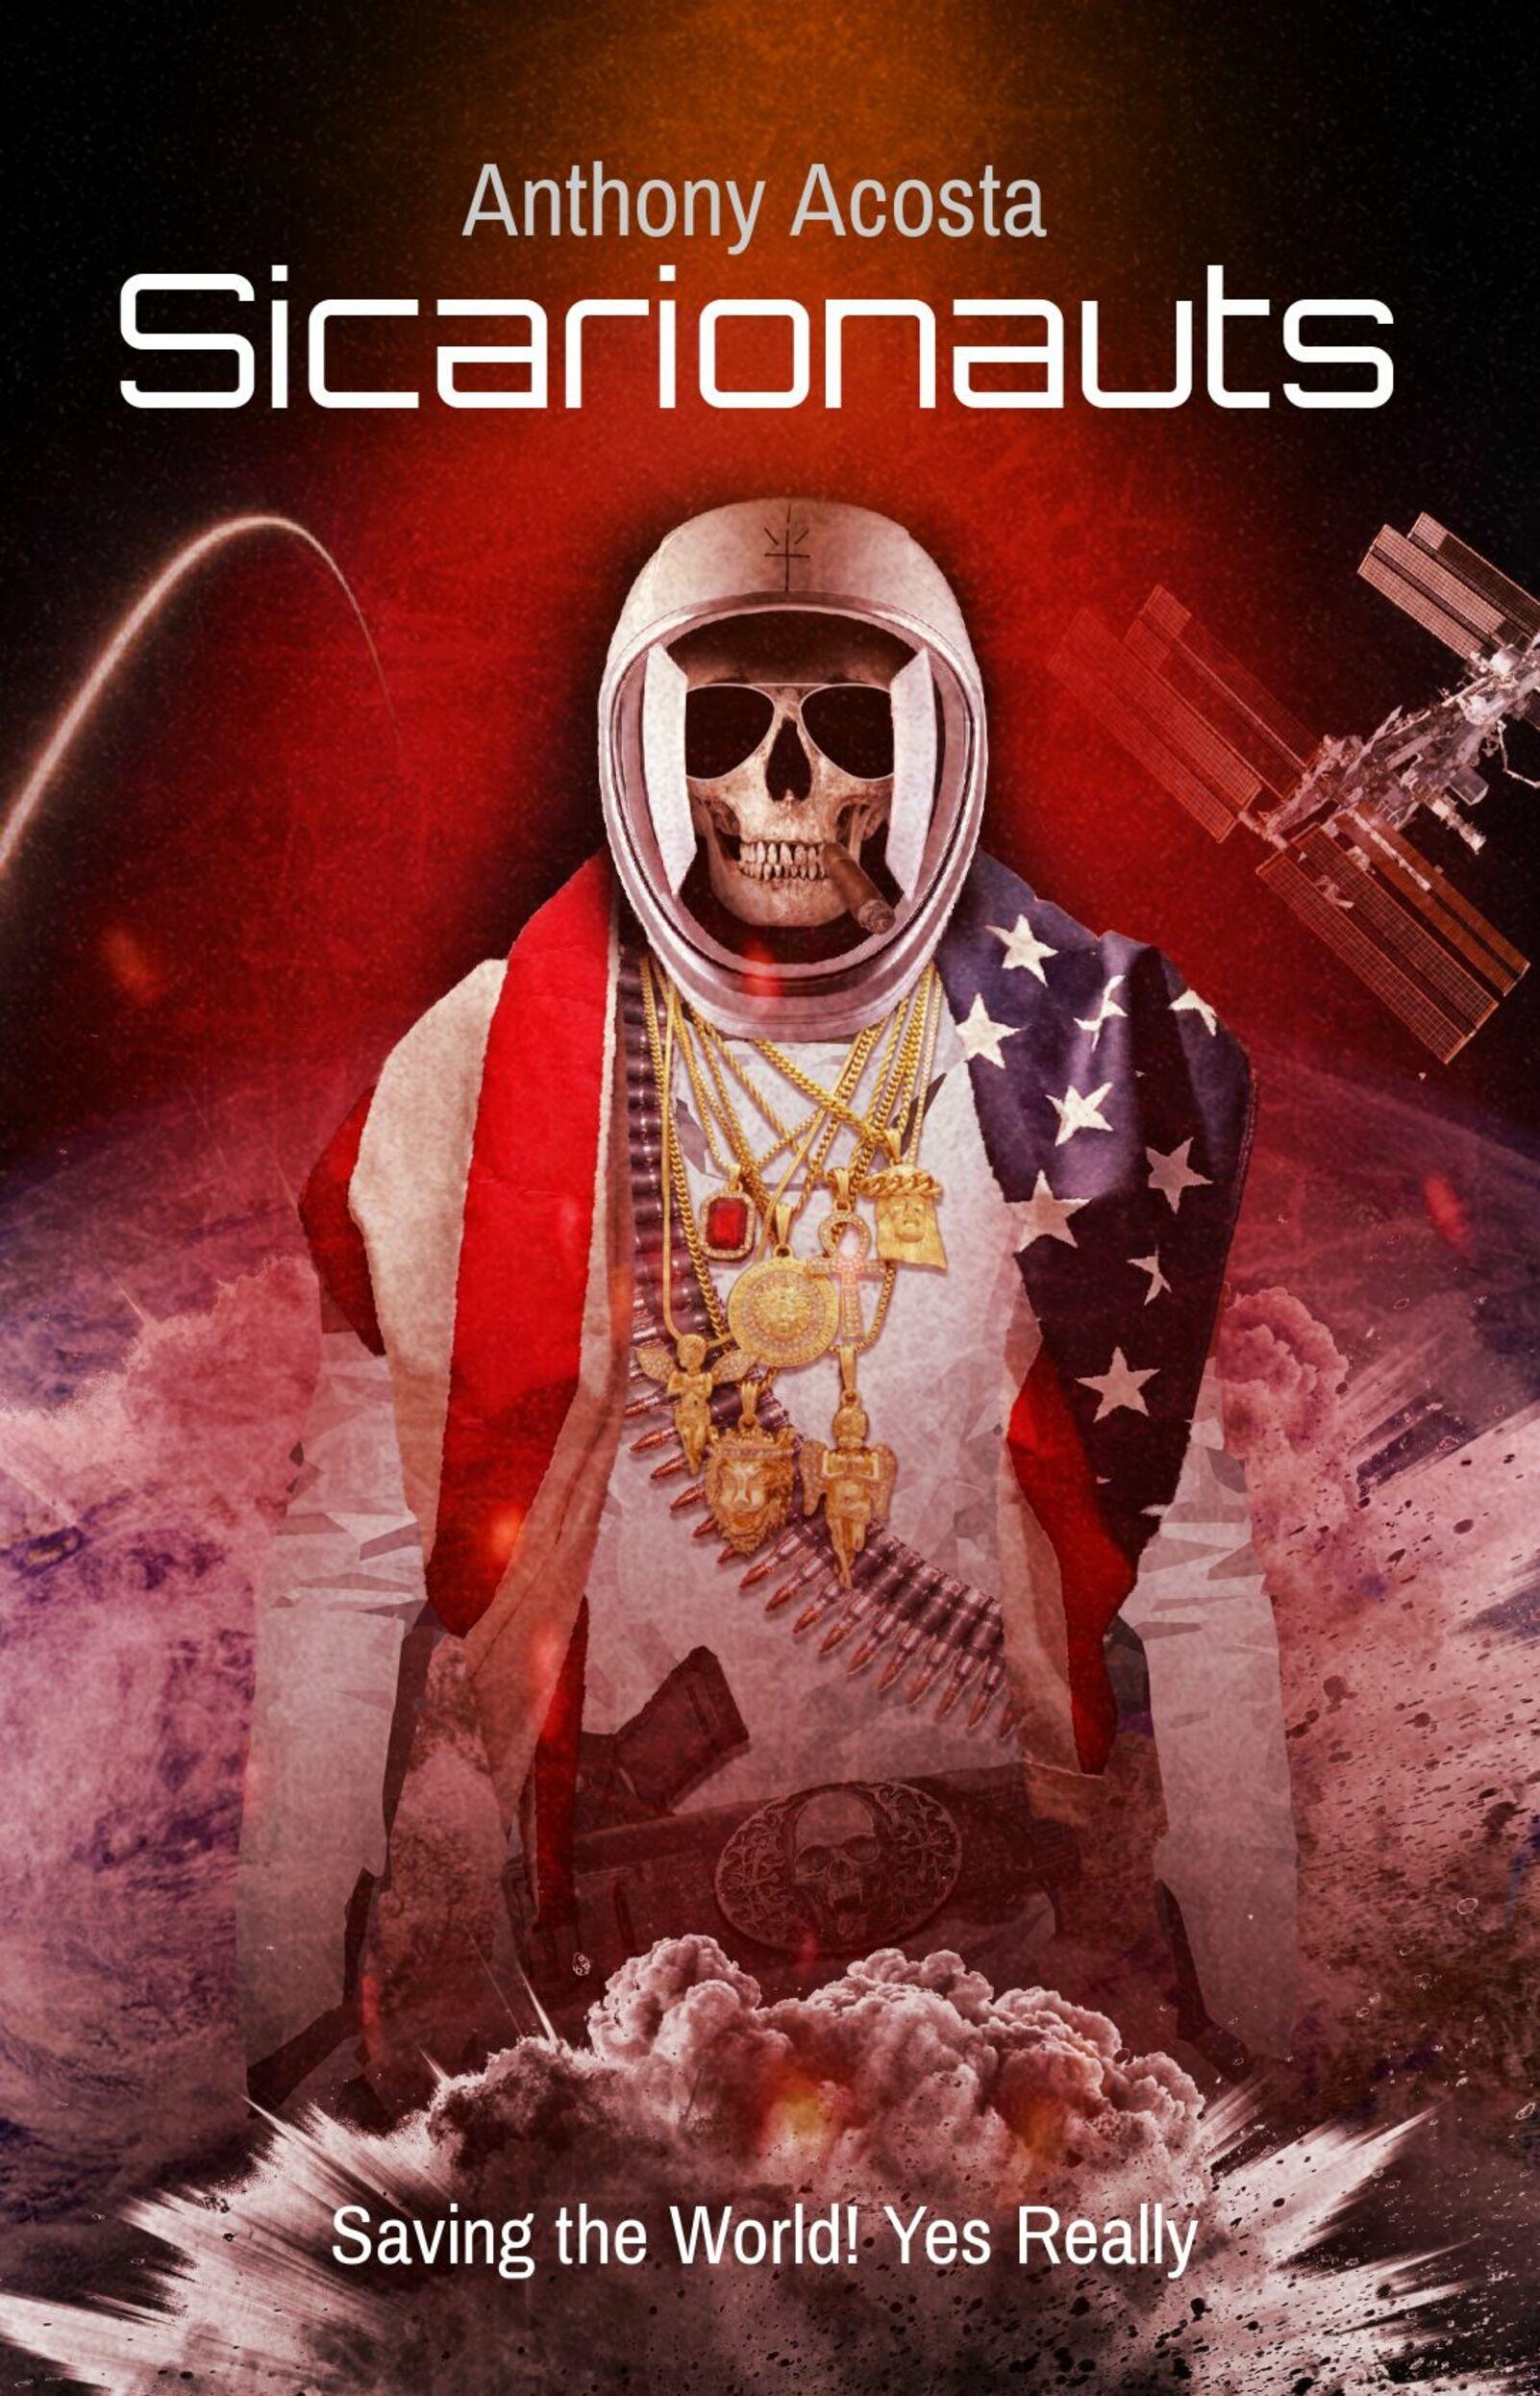 Sicarios in Space? - New Adventure